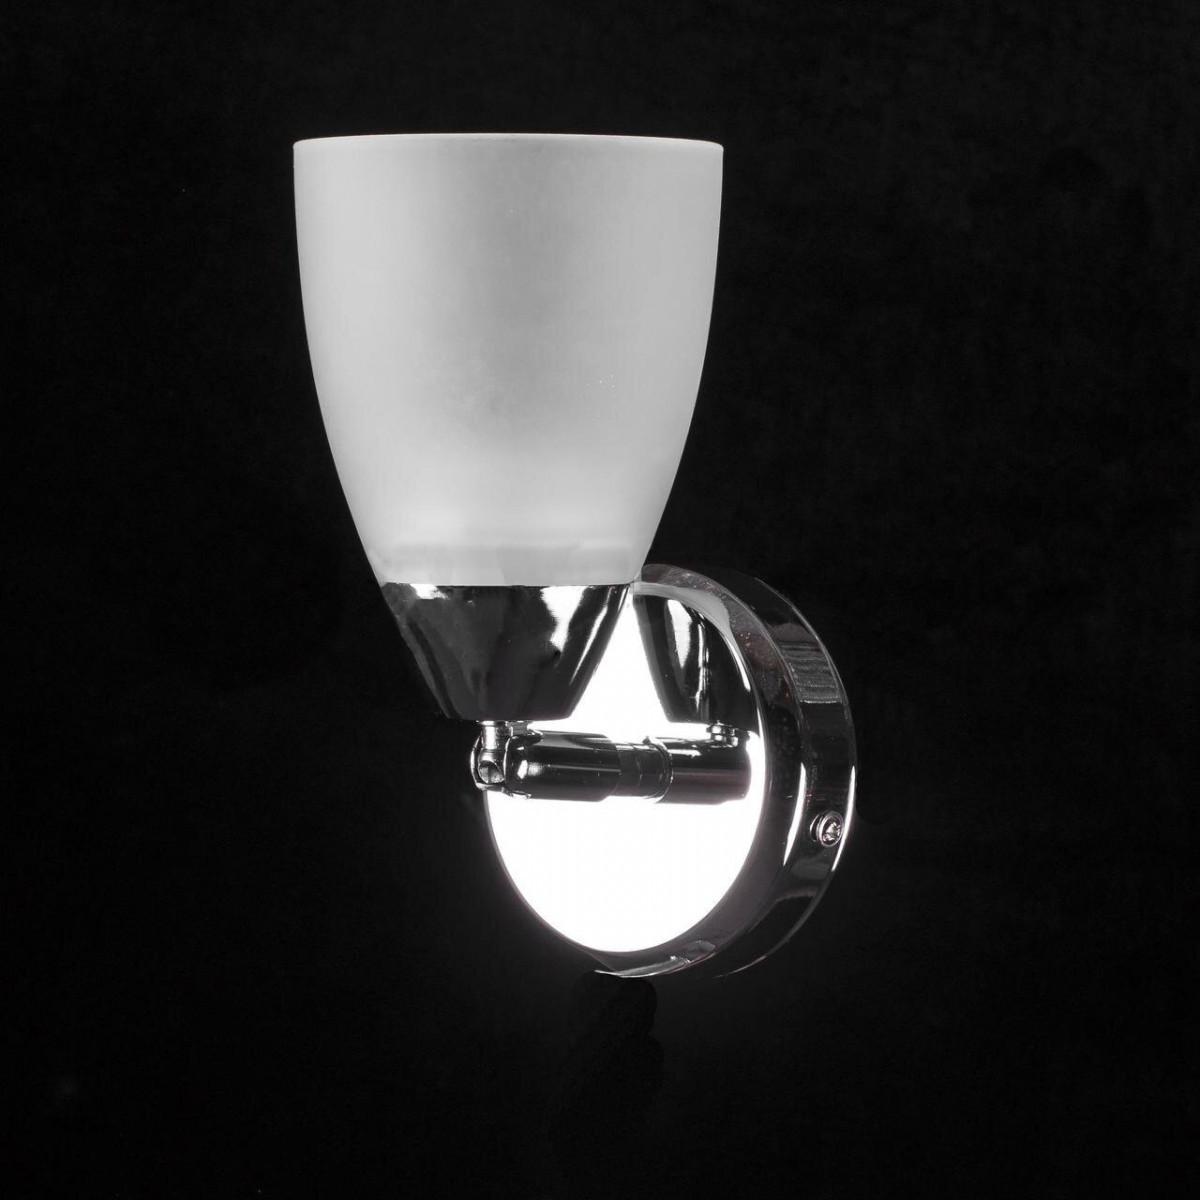 Бра спот на 1 лампочку P3-01615/1W/CRWT